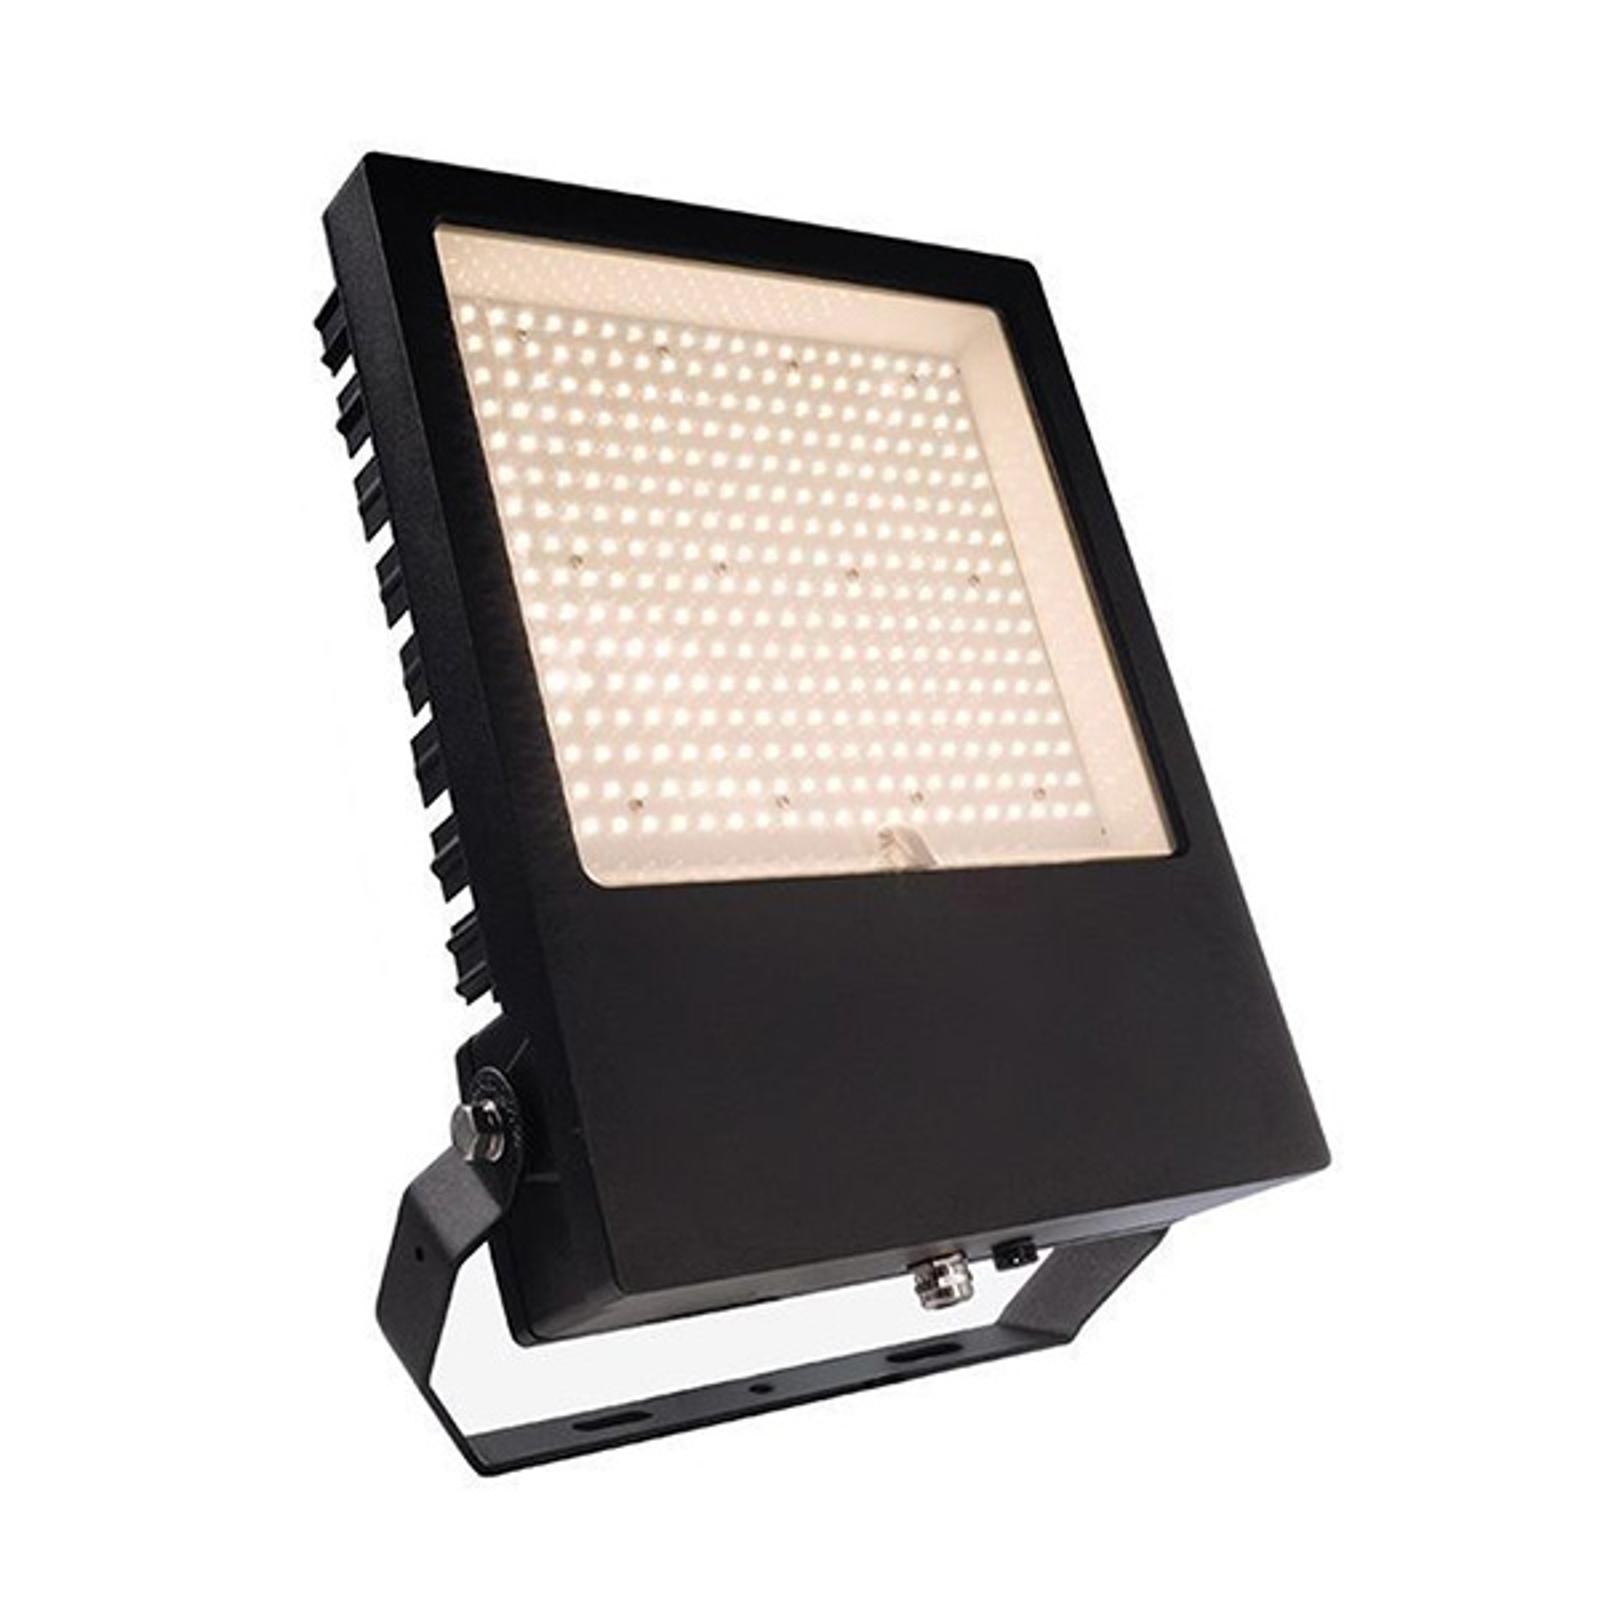 LED-Außenstrahler Atik, 3.000 K, 200 W